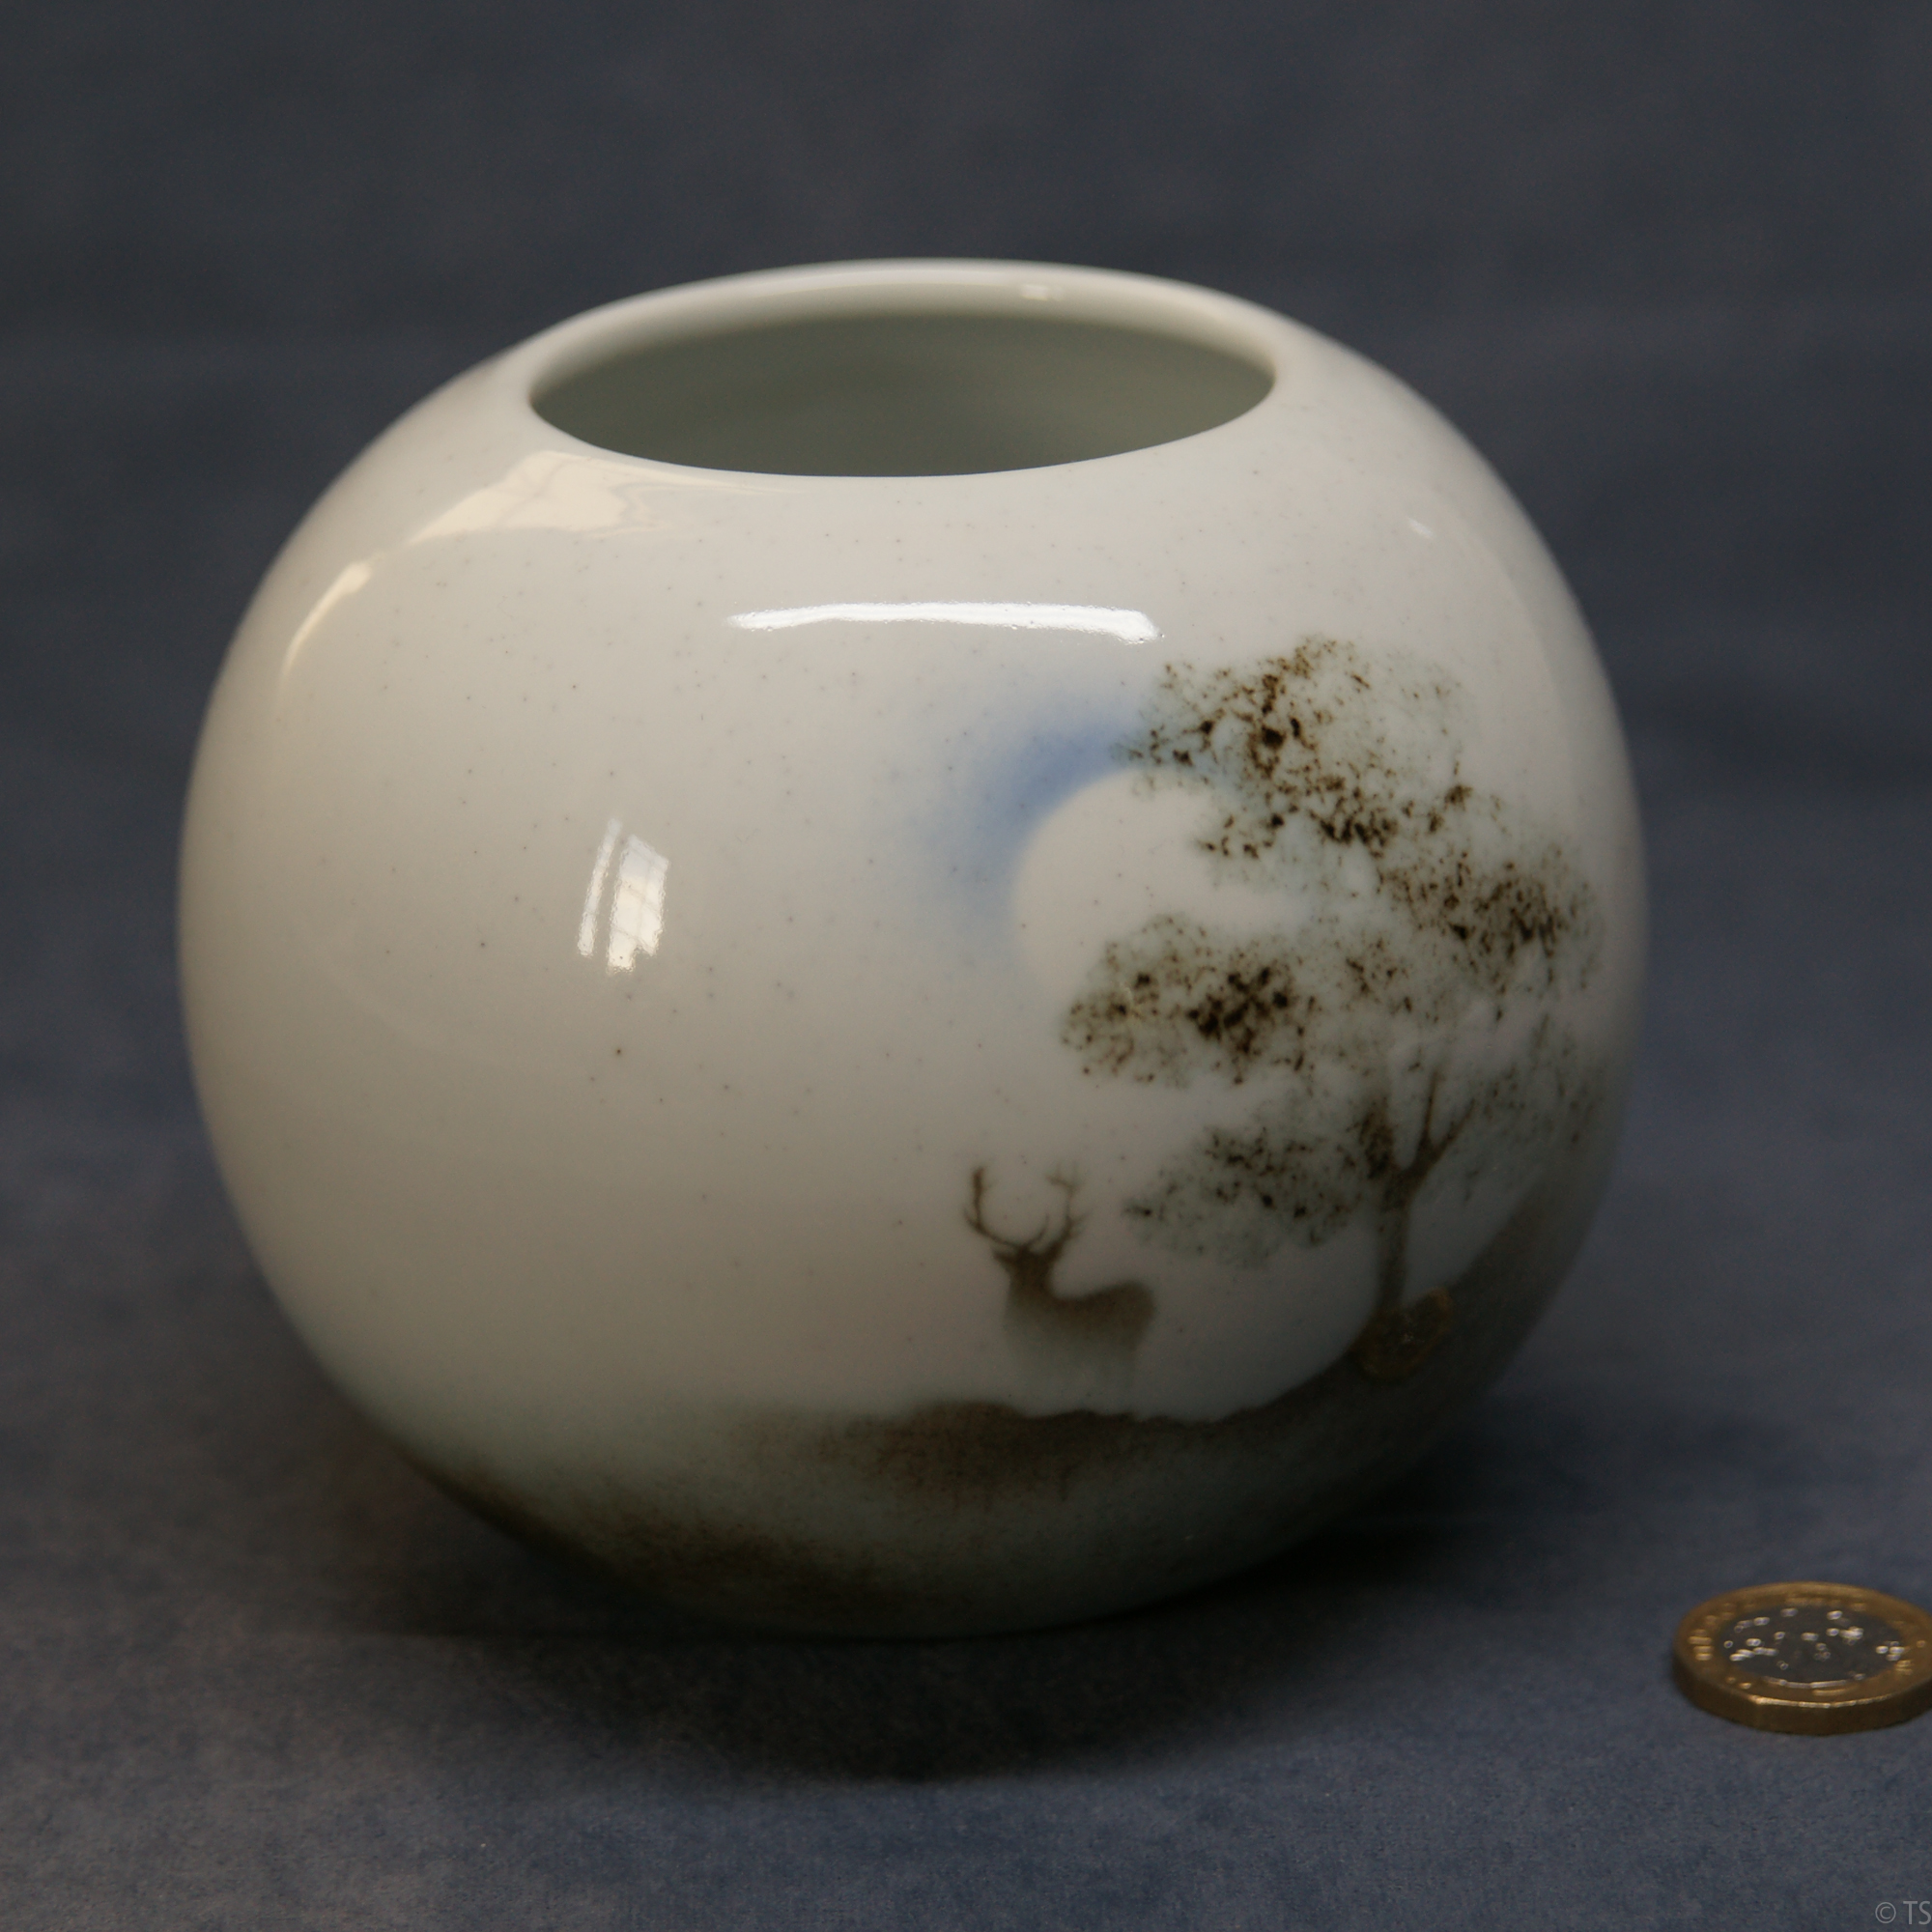 Round Vase Stag